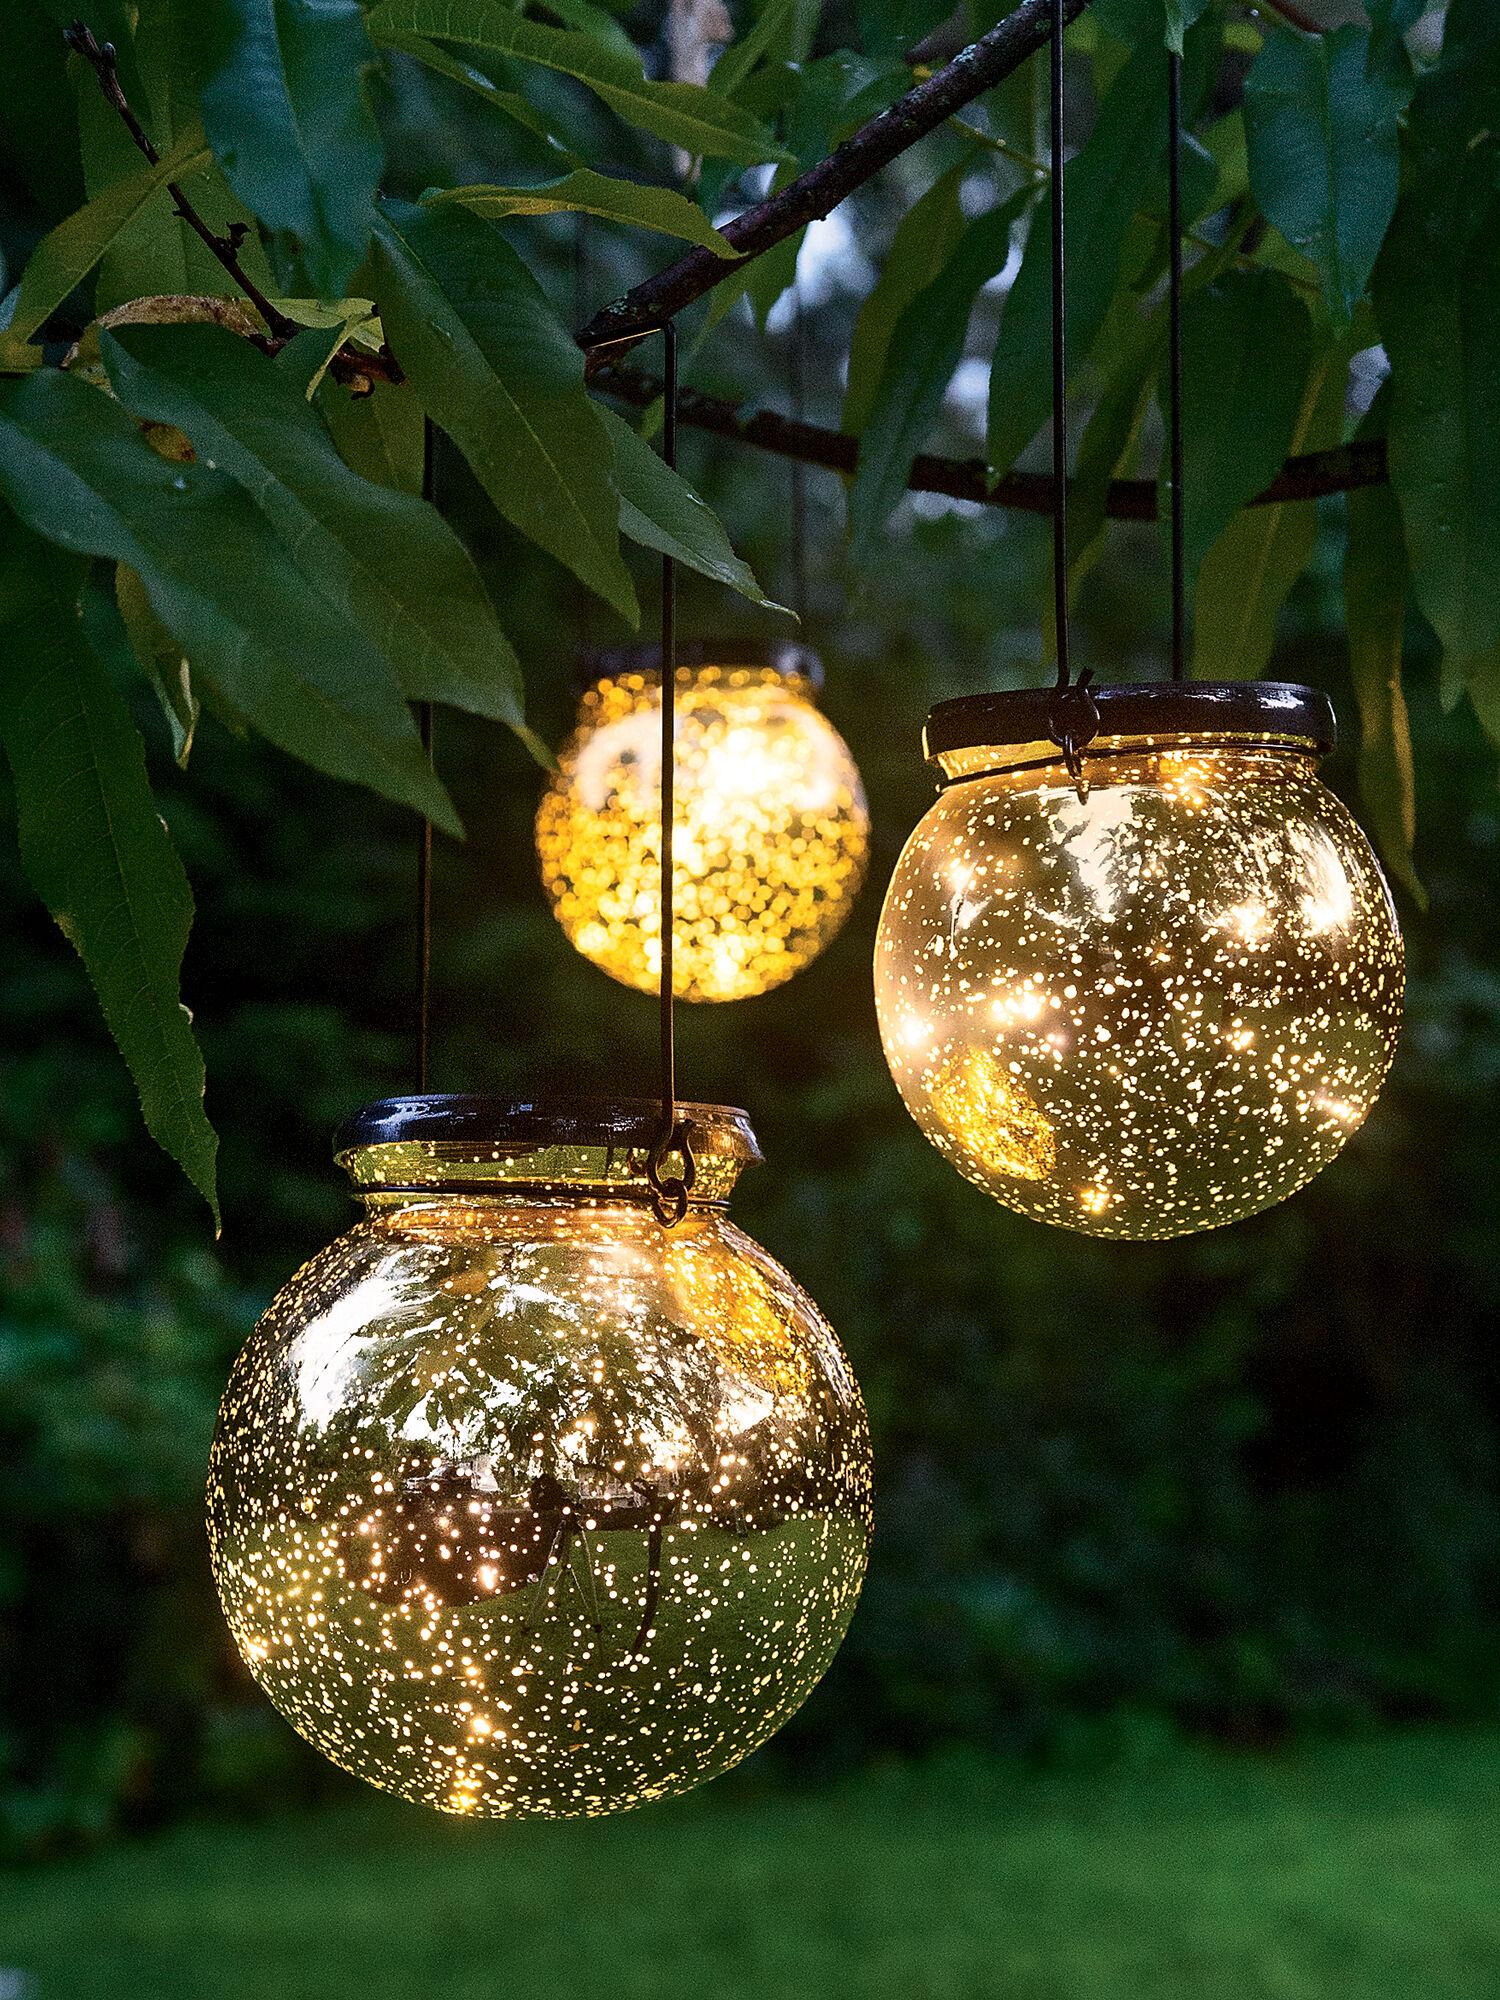 led garden lights from gardener 39 s supply of vermont. Black Bedroom Furniture Sets. Home Design Ideas